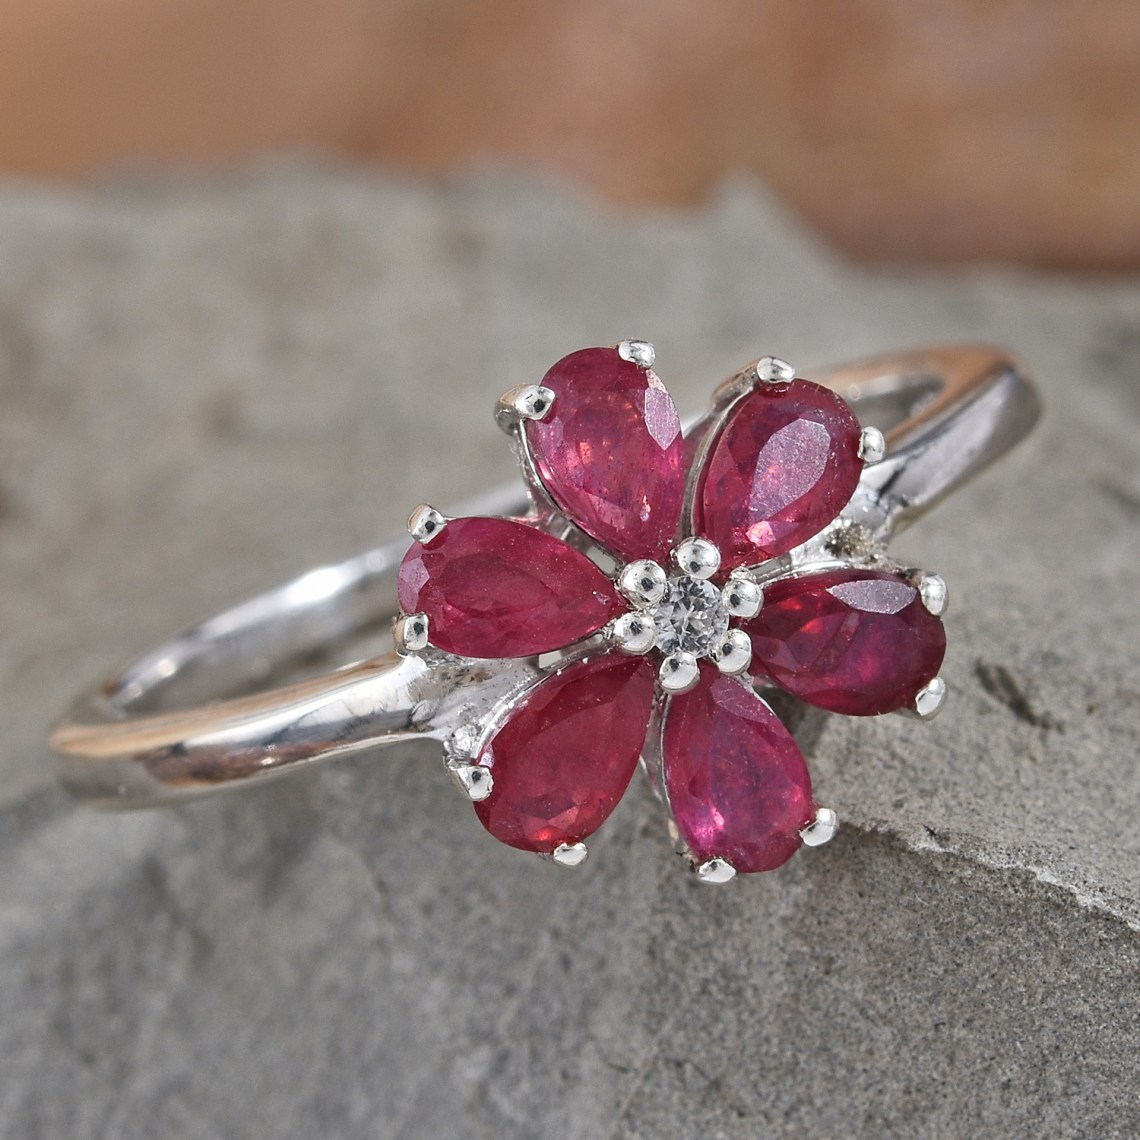 Floral ruby ring daintily resting on granite display.